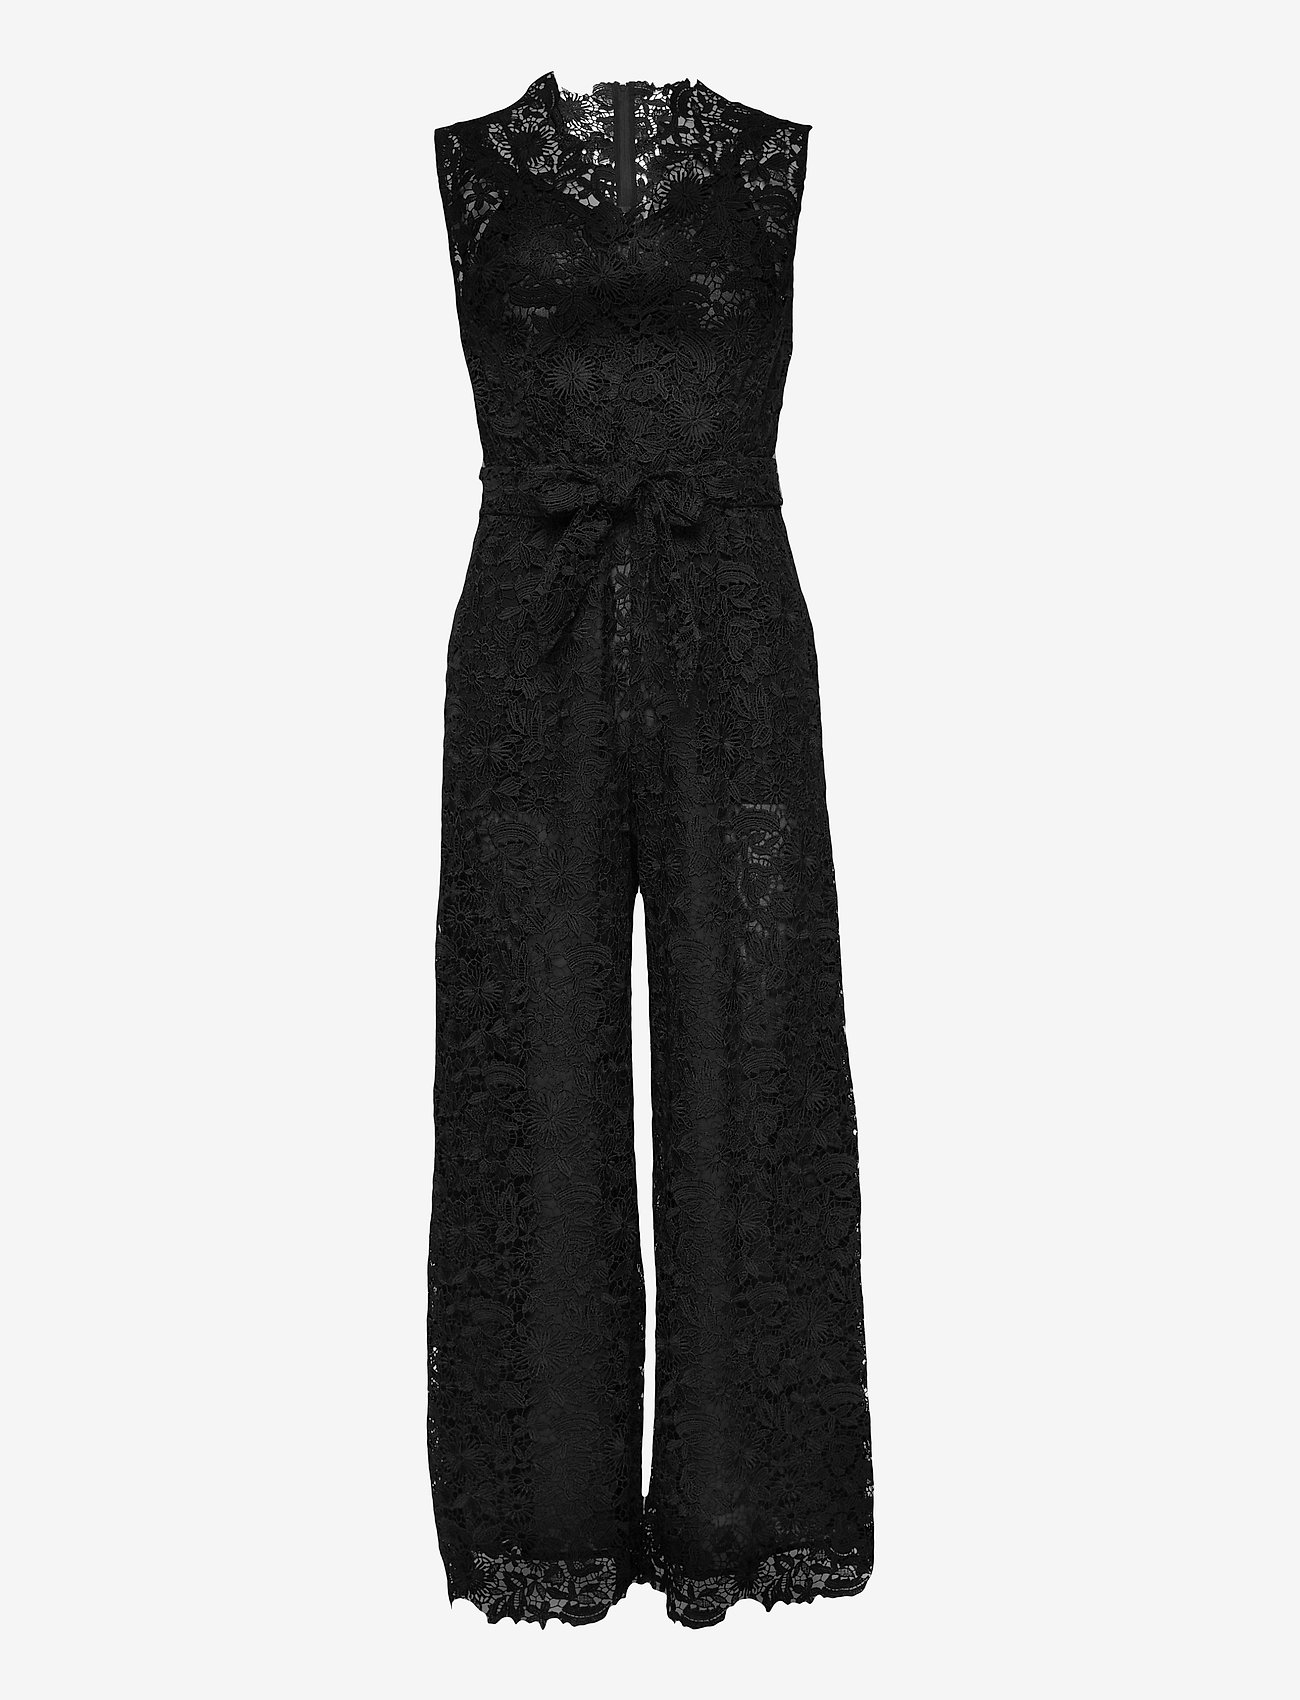 SAND - 3180 - Whitney 2 - jumpsuits - black - 0